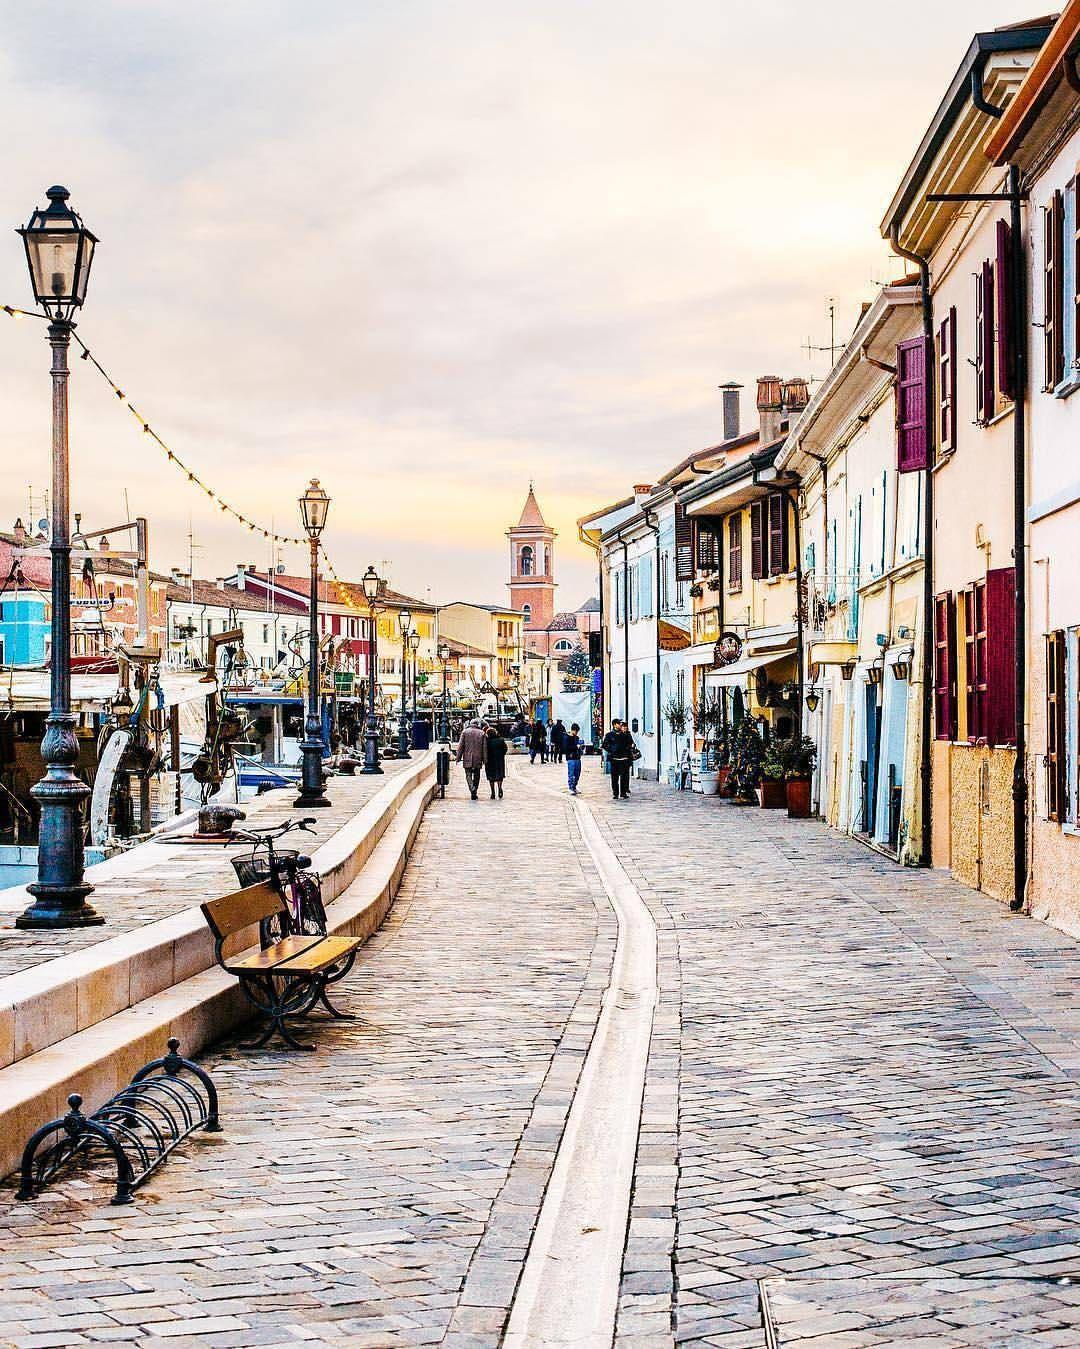 Cesenatico Italy | Travel, Travel destinations, Seaside towns